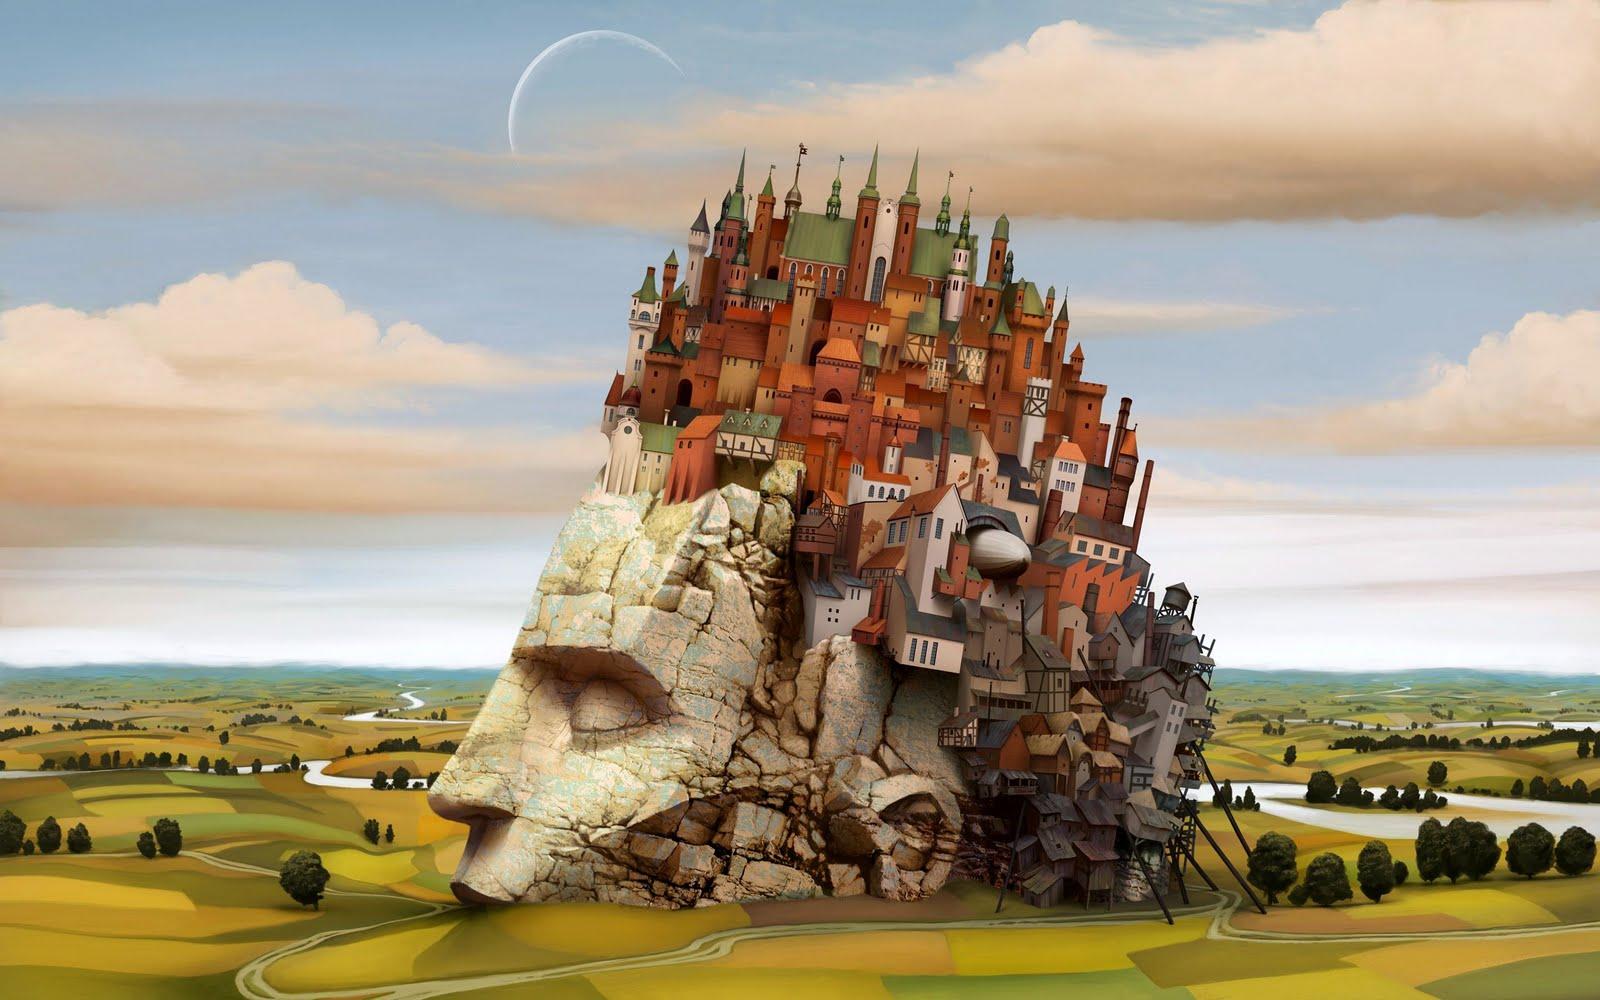 Artist Inspiration : Jacek Yerka   AlyZen Moonshadow